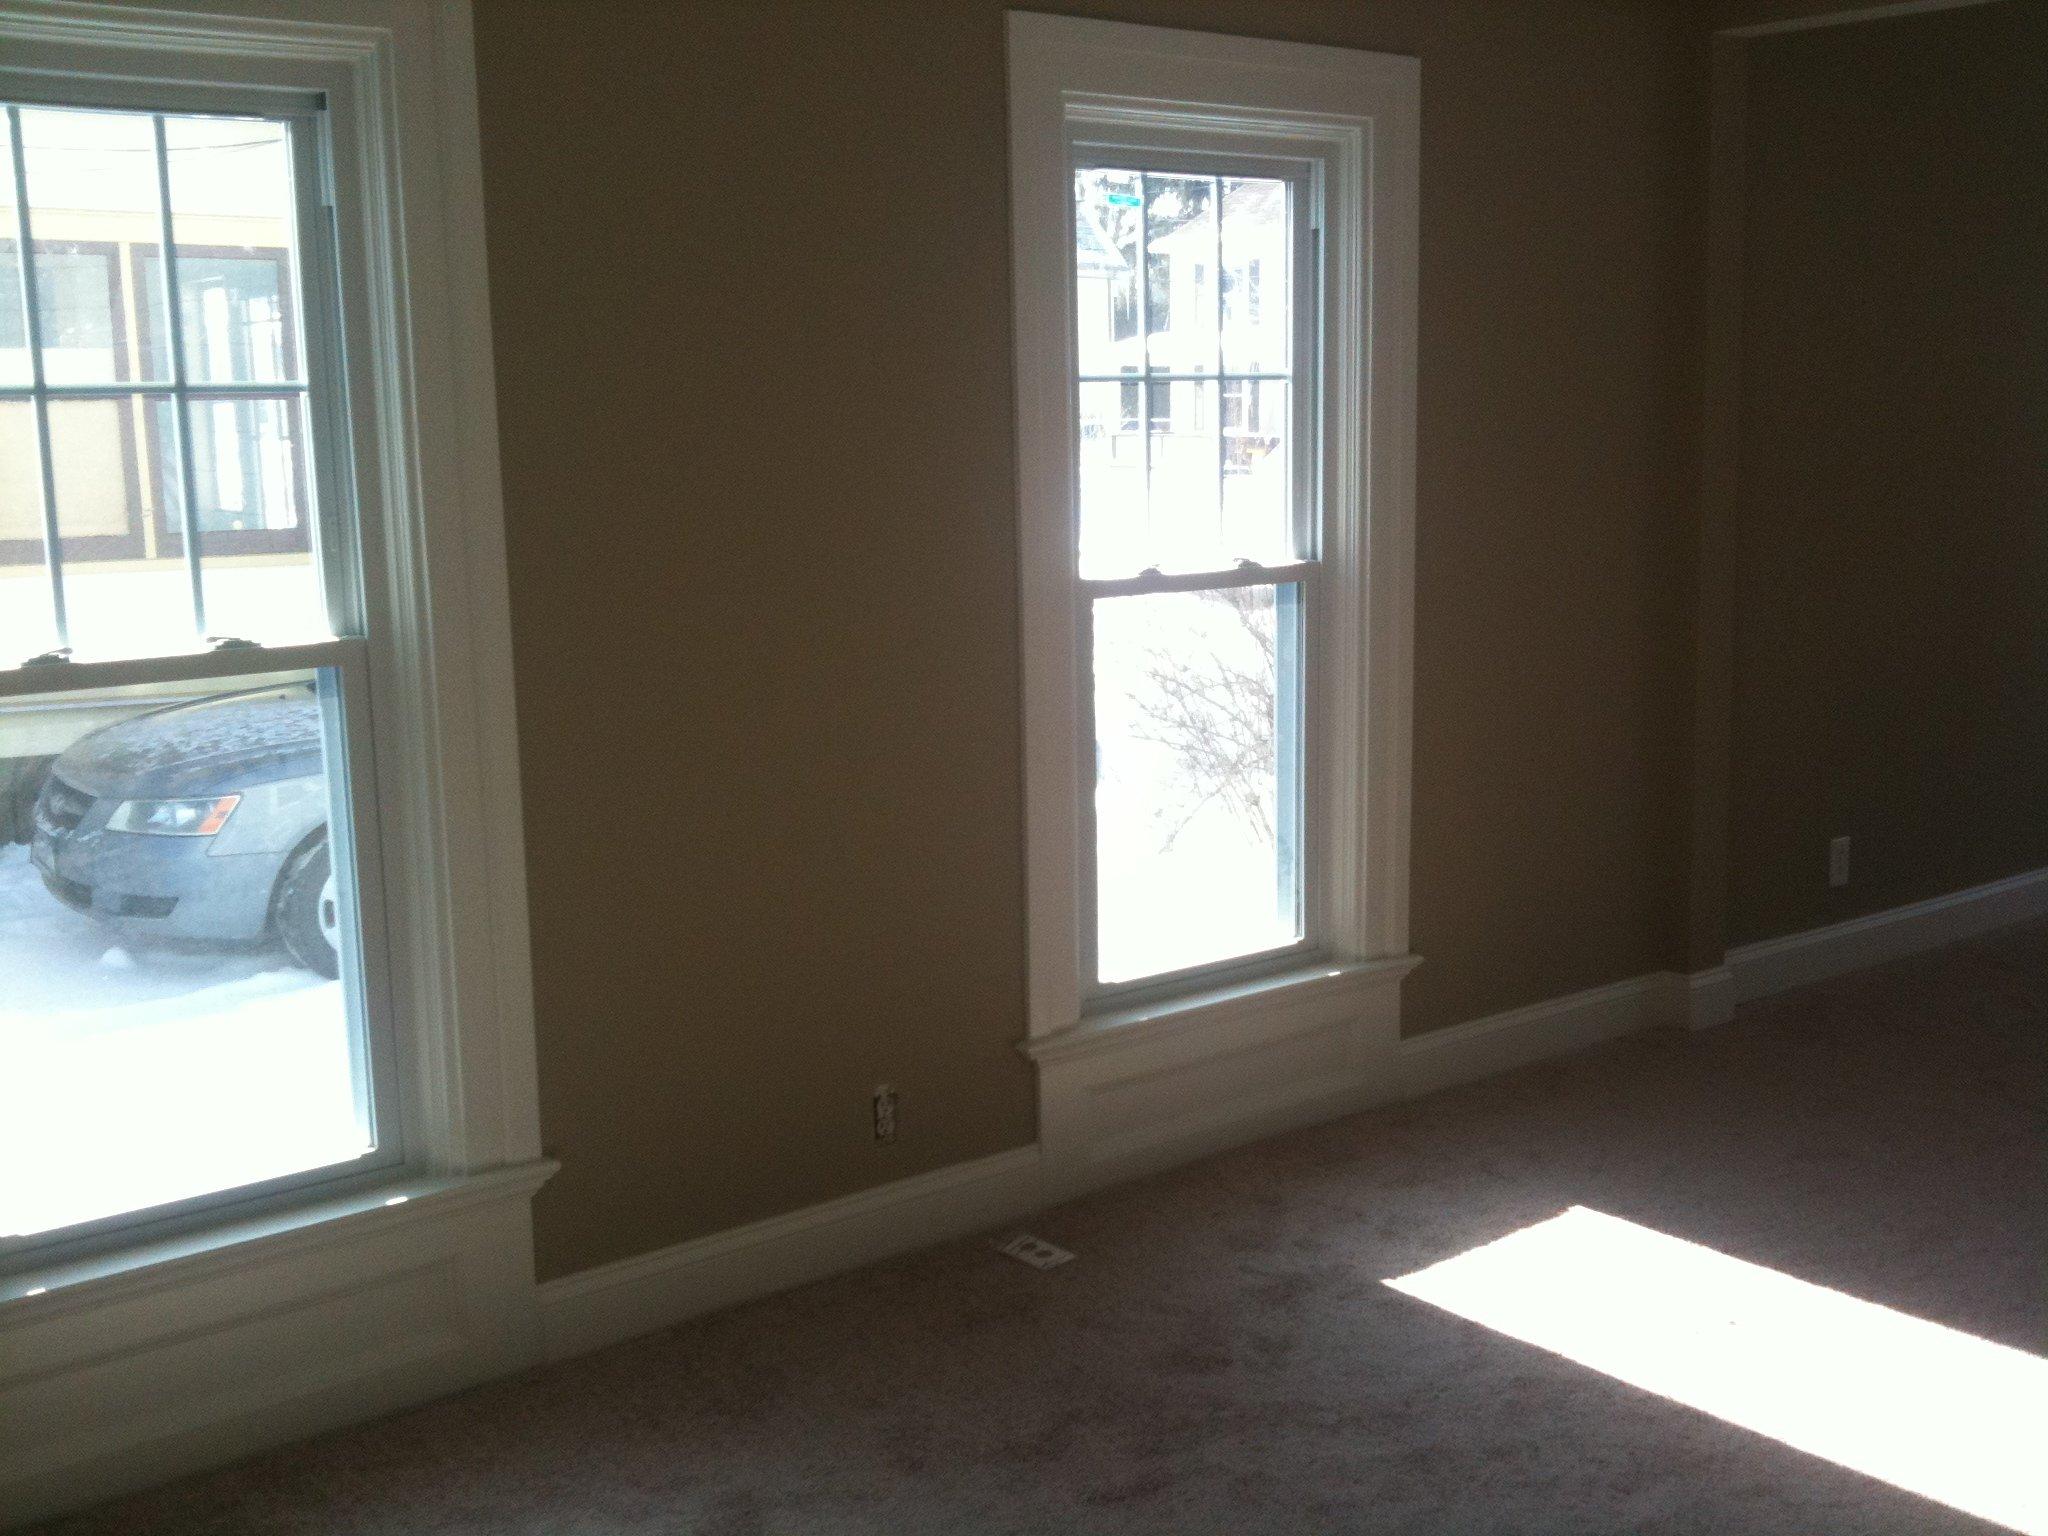 Neutral walls, white trim